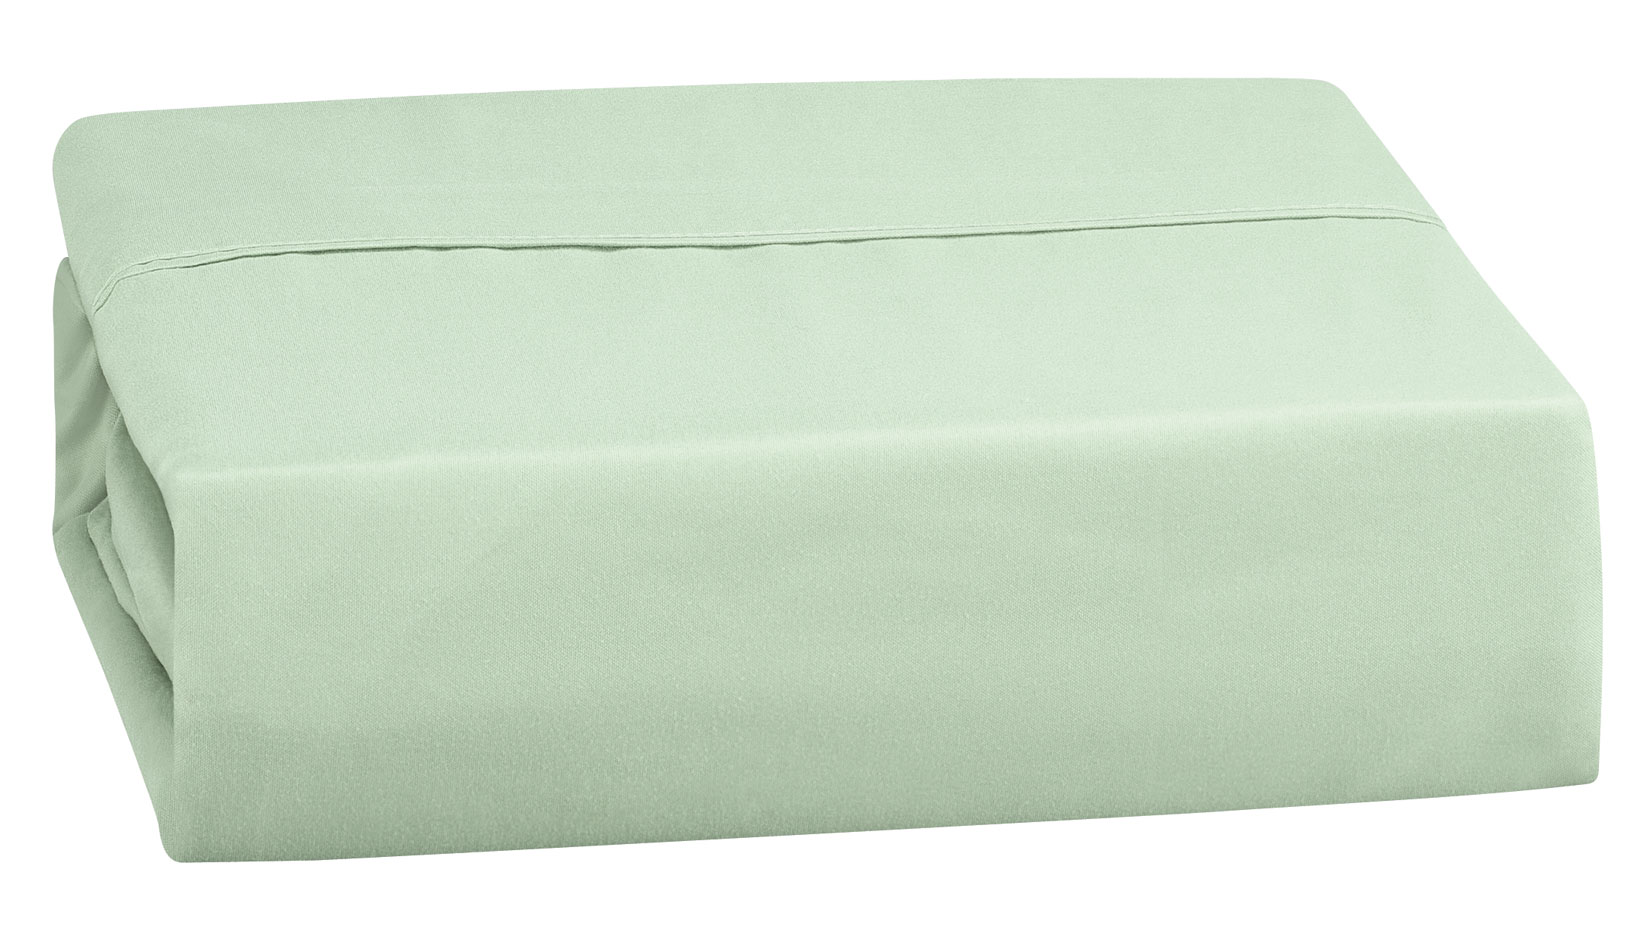 Luxurious-Microfiber-Sheet-Set thumbnail 5